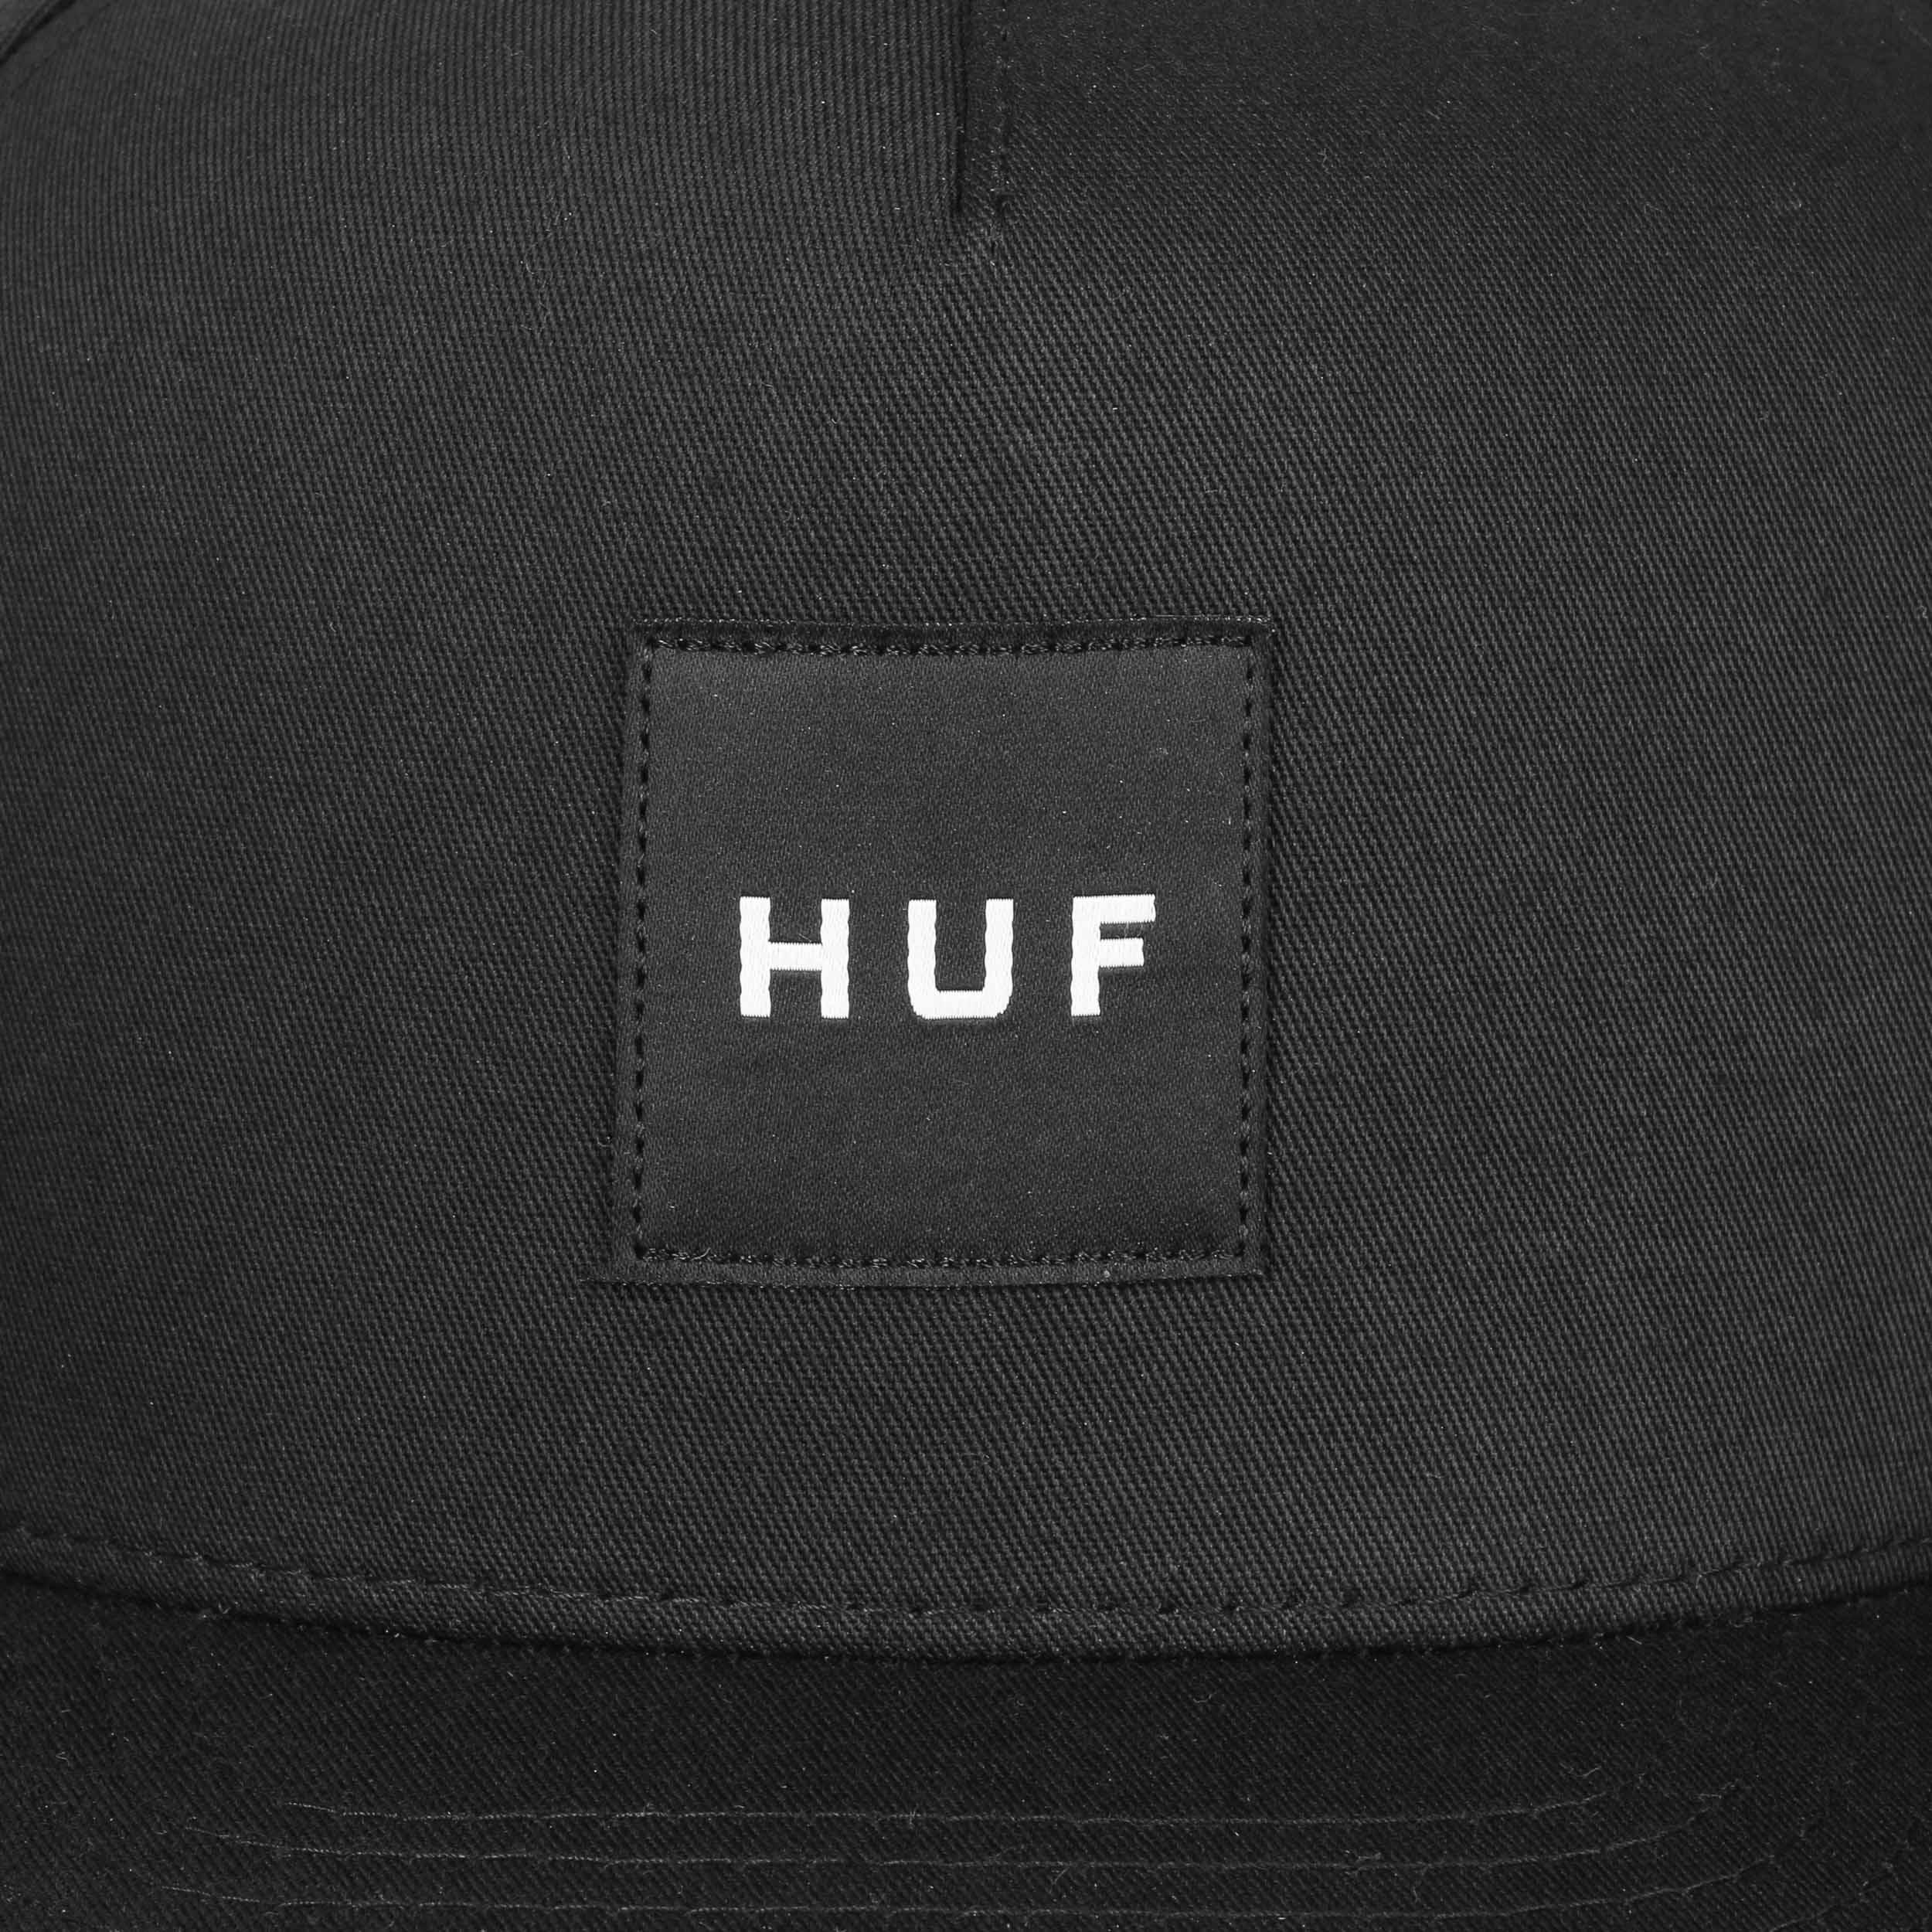 Gorra Box Logo Cotton Snapback by HUF - Gorras - sombreroshop.es 957fc699ddb